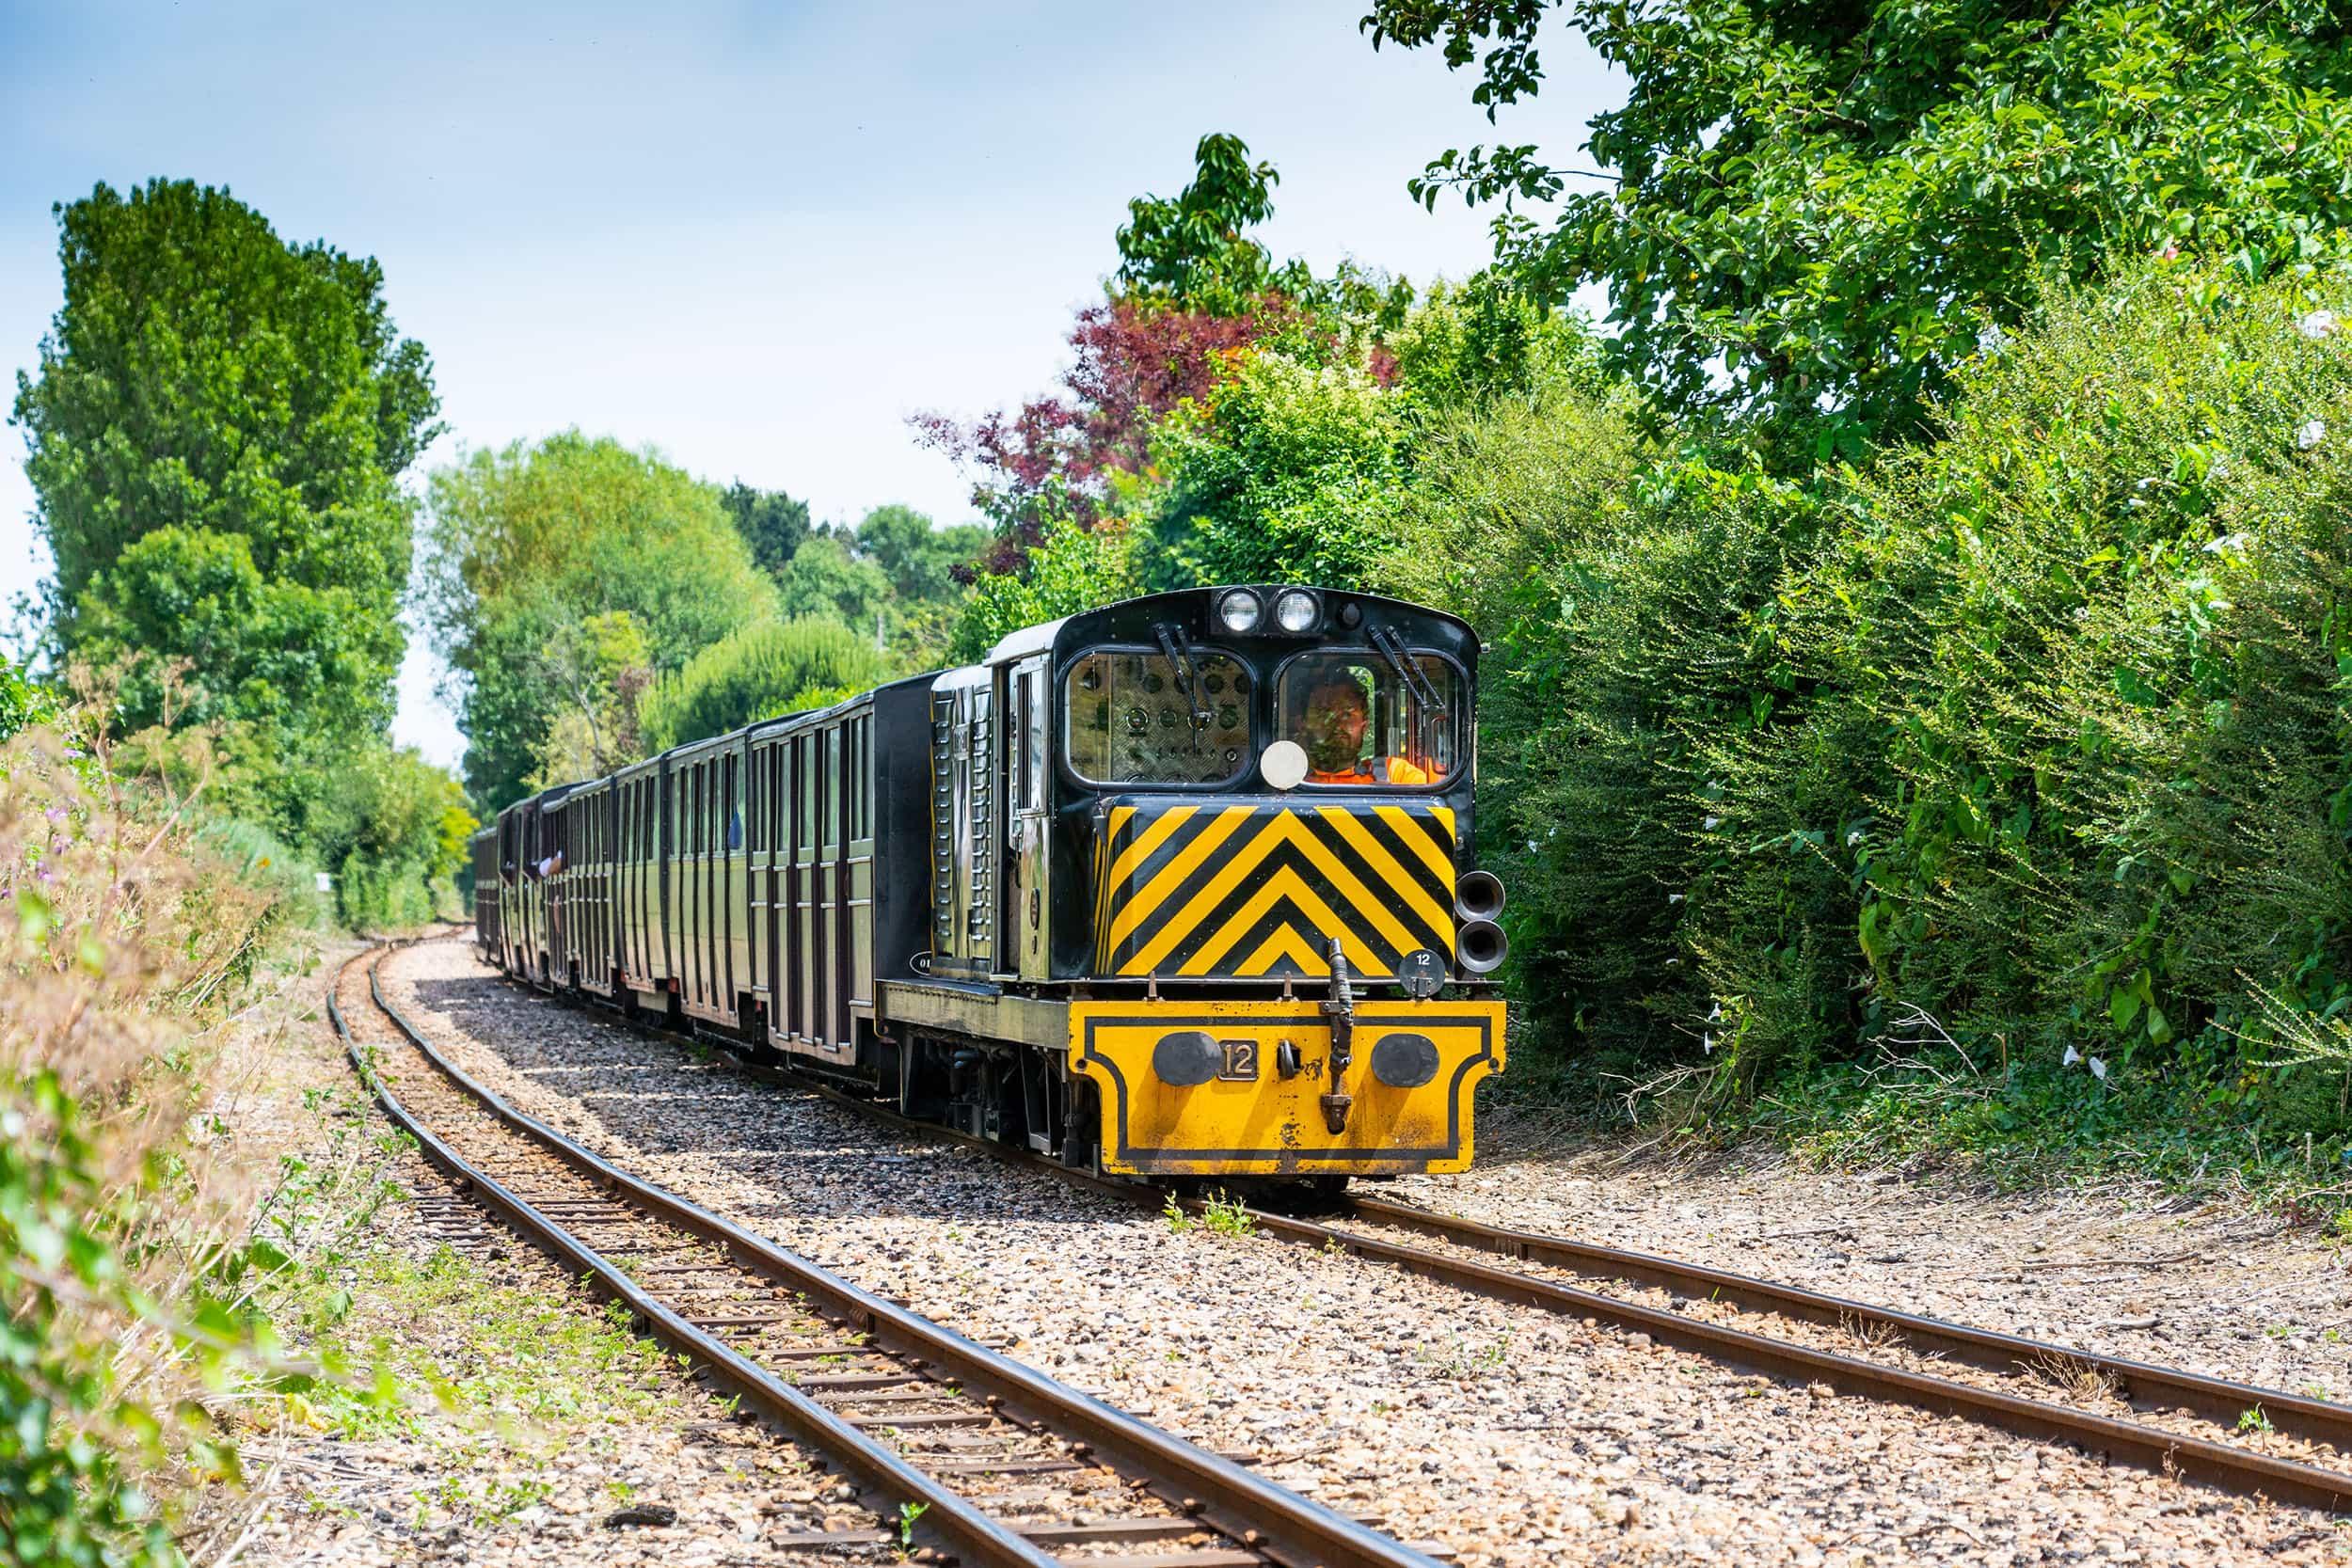 J B Snell - Romney, Hythe & Dymchurch Railway